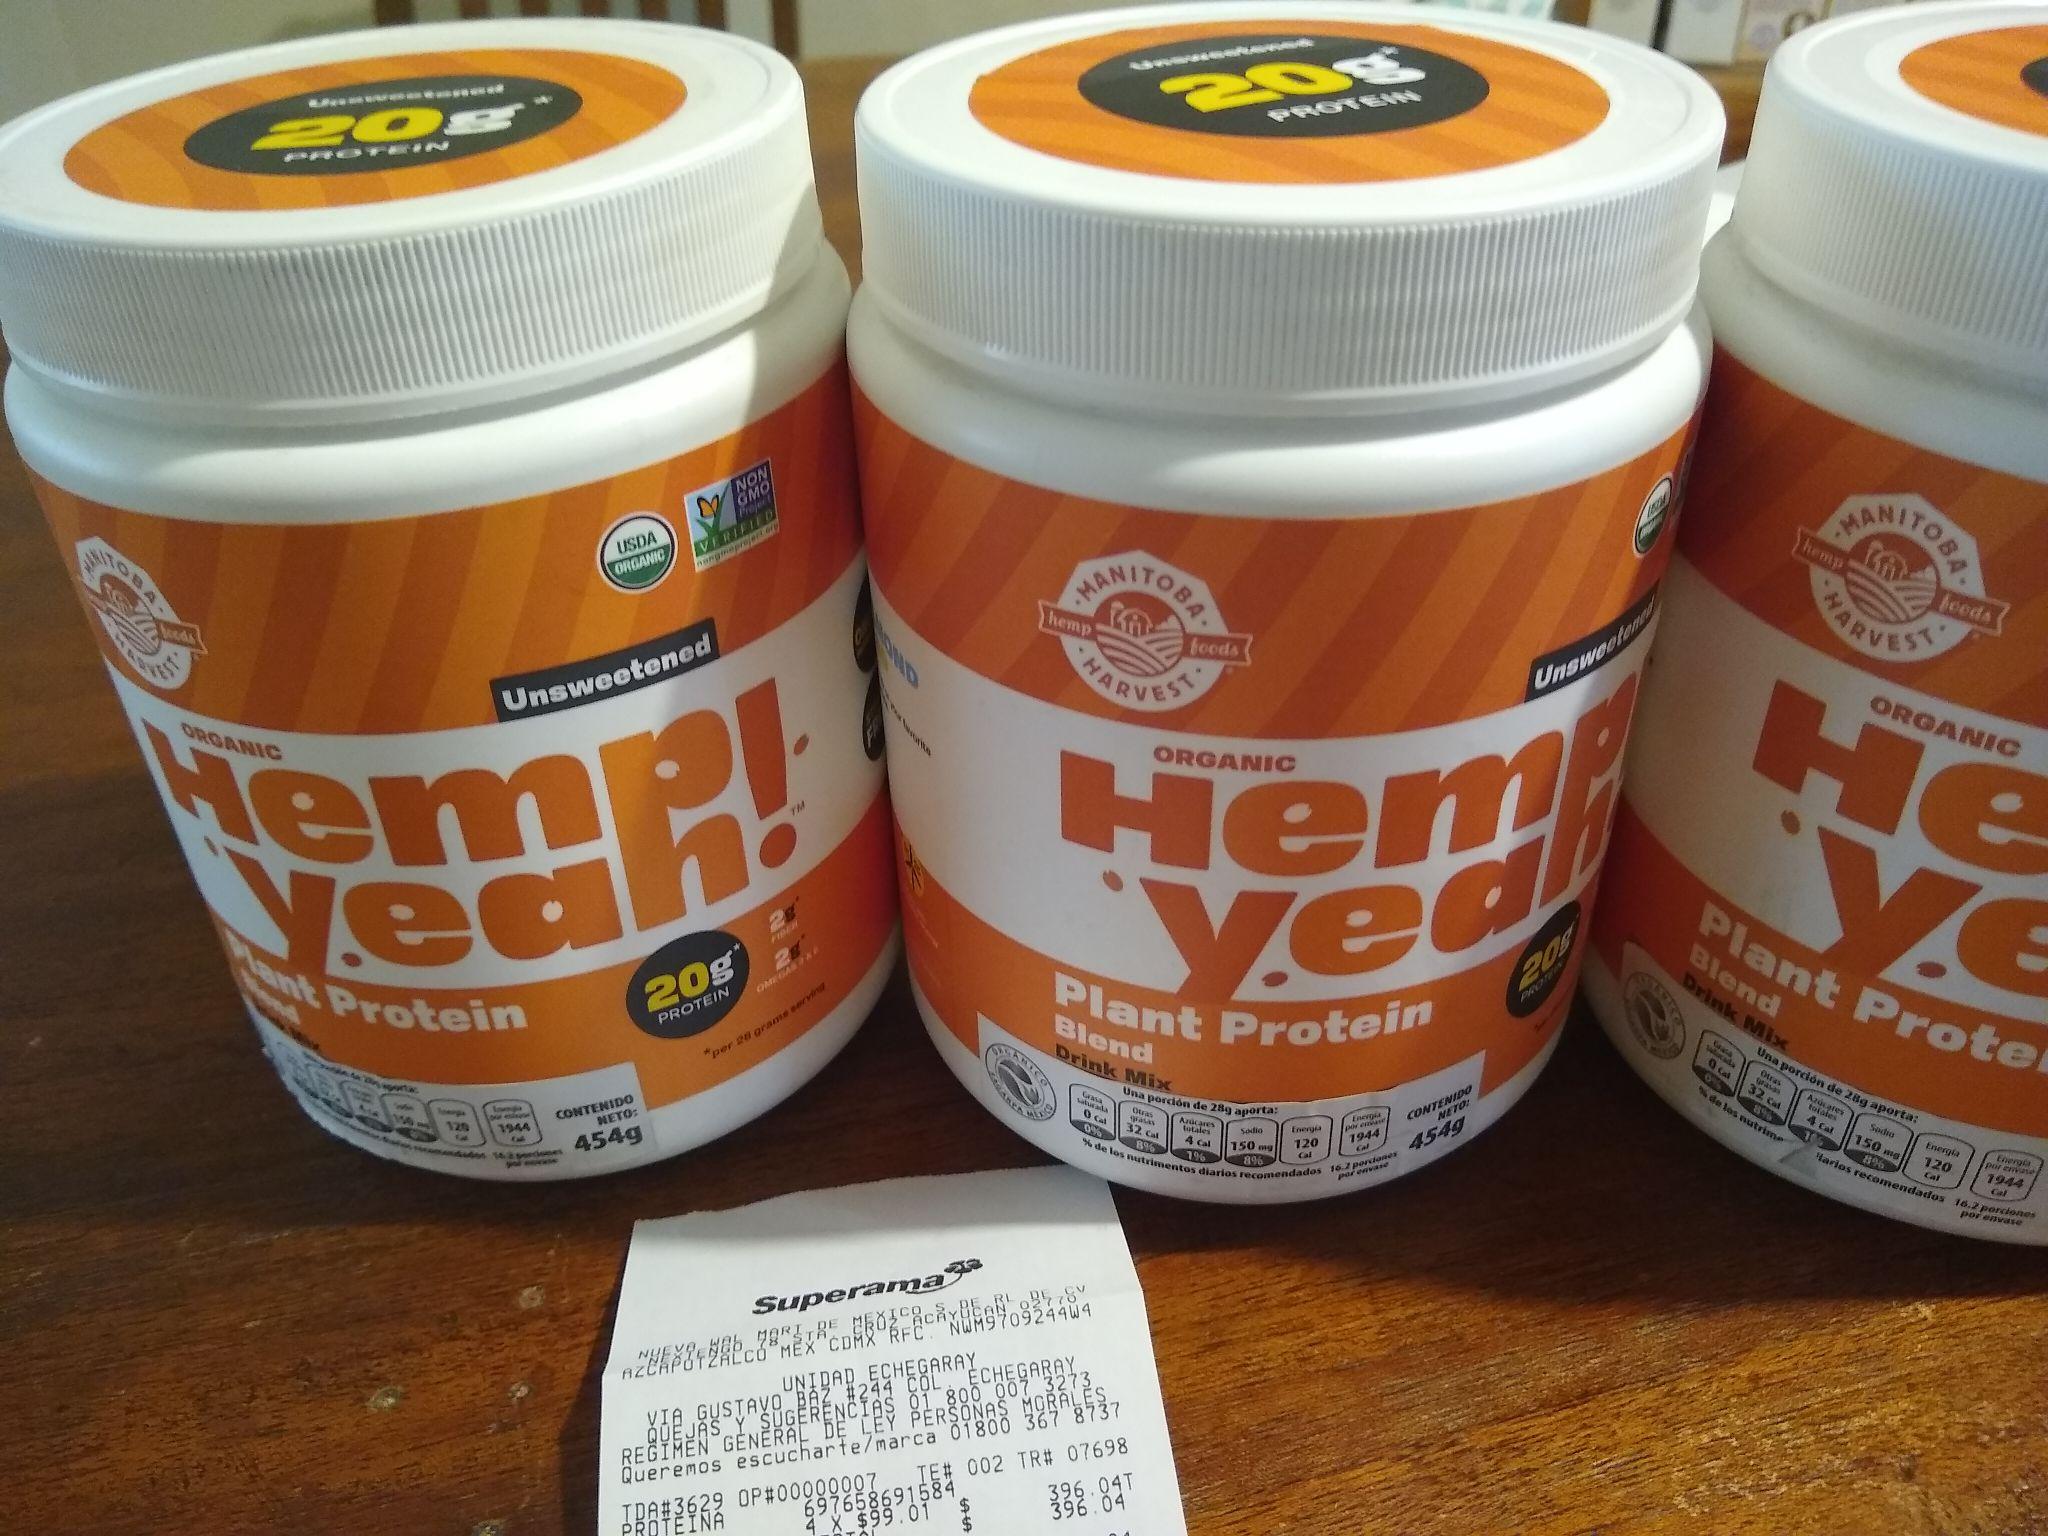 Superama Proteína Hemp USDA Organic de $499 a